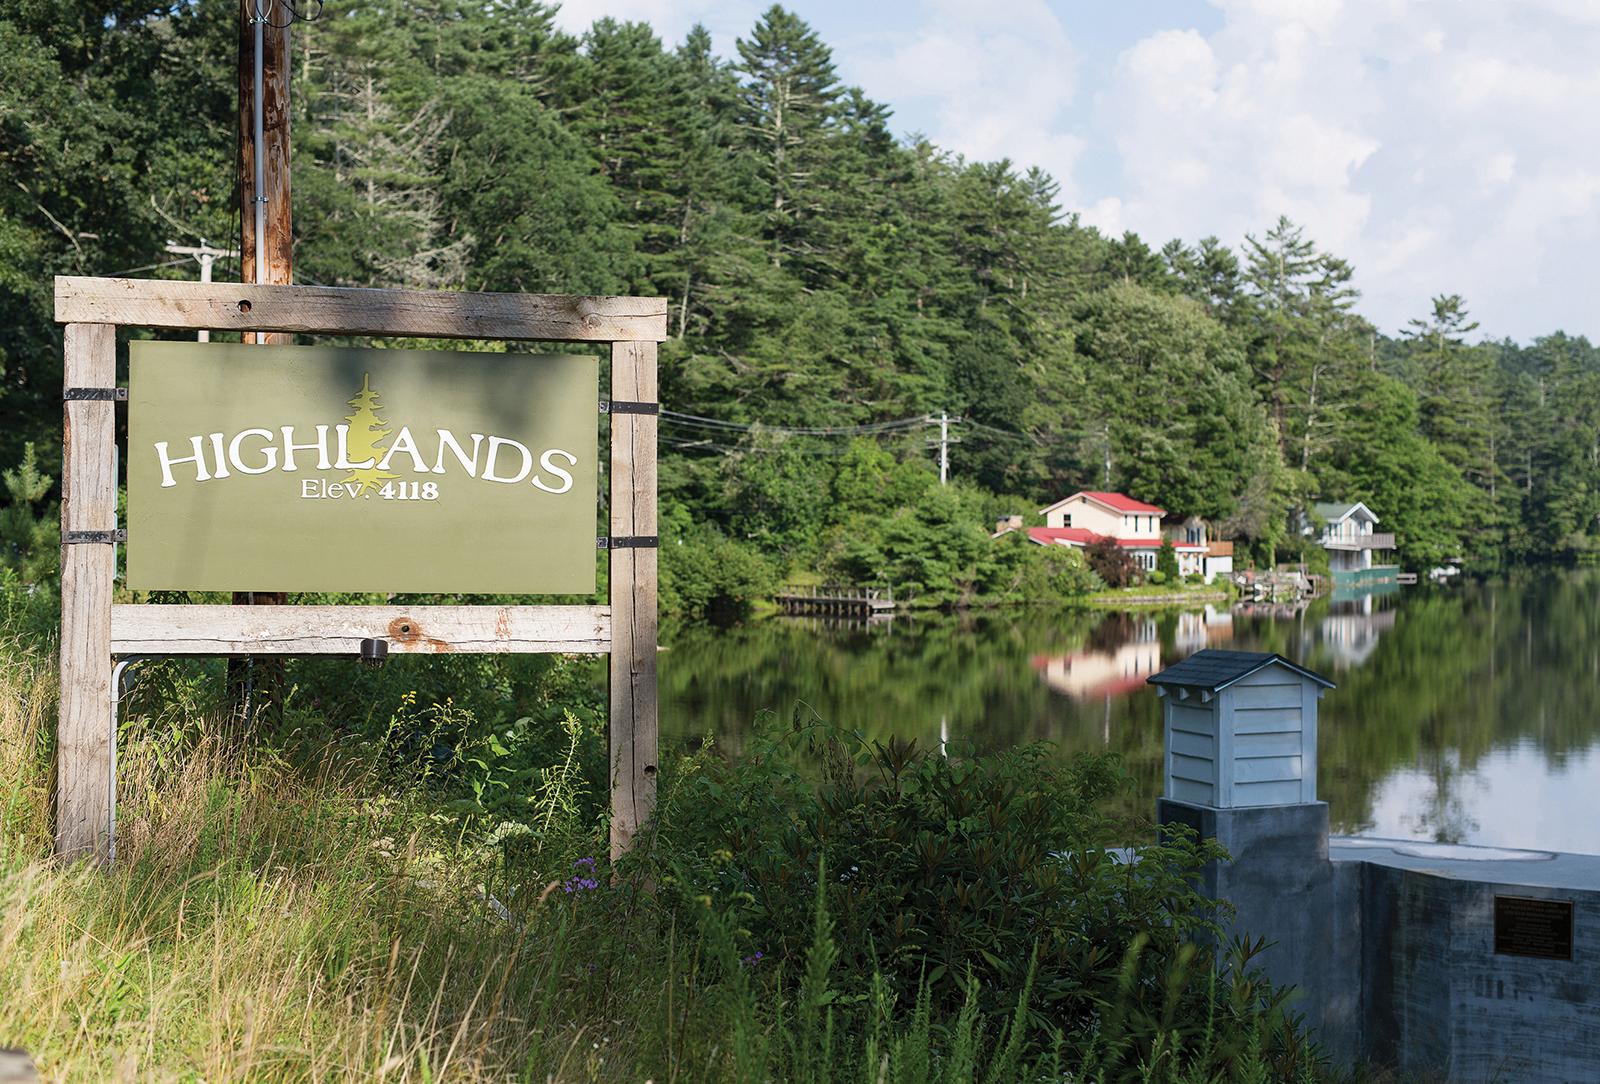 highlands-nc-sign